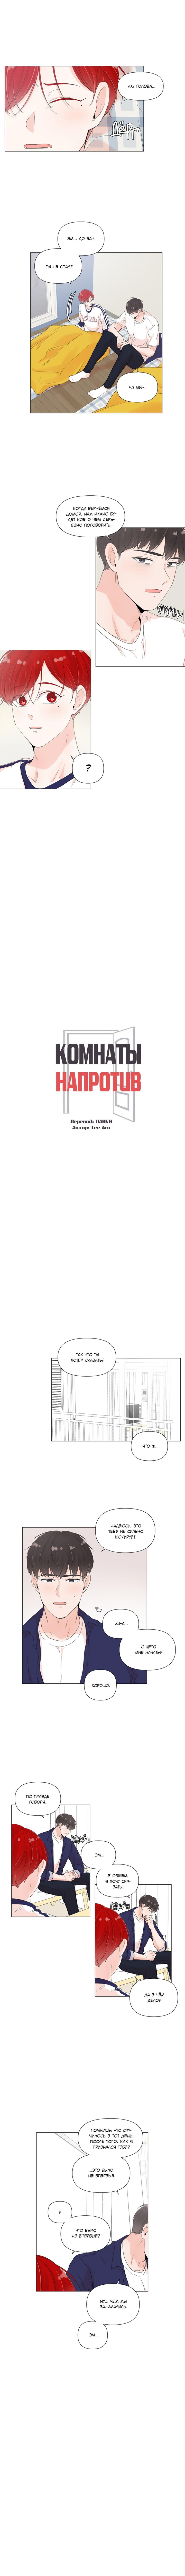 Манга Комнаты напротив - Глава 33 Страница 1